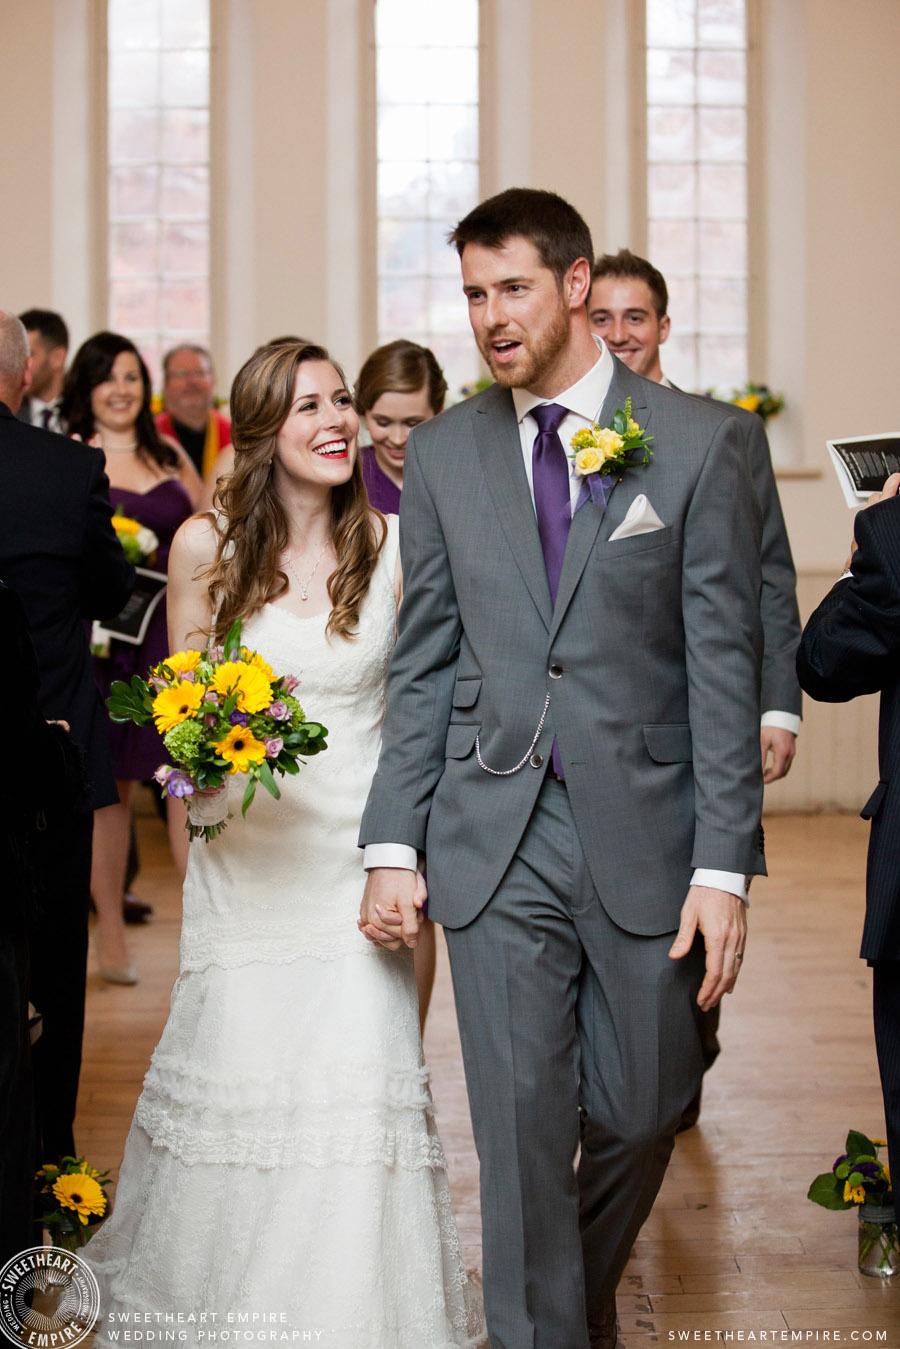 Musicians Wedding-Enoch Turner_55_s